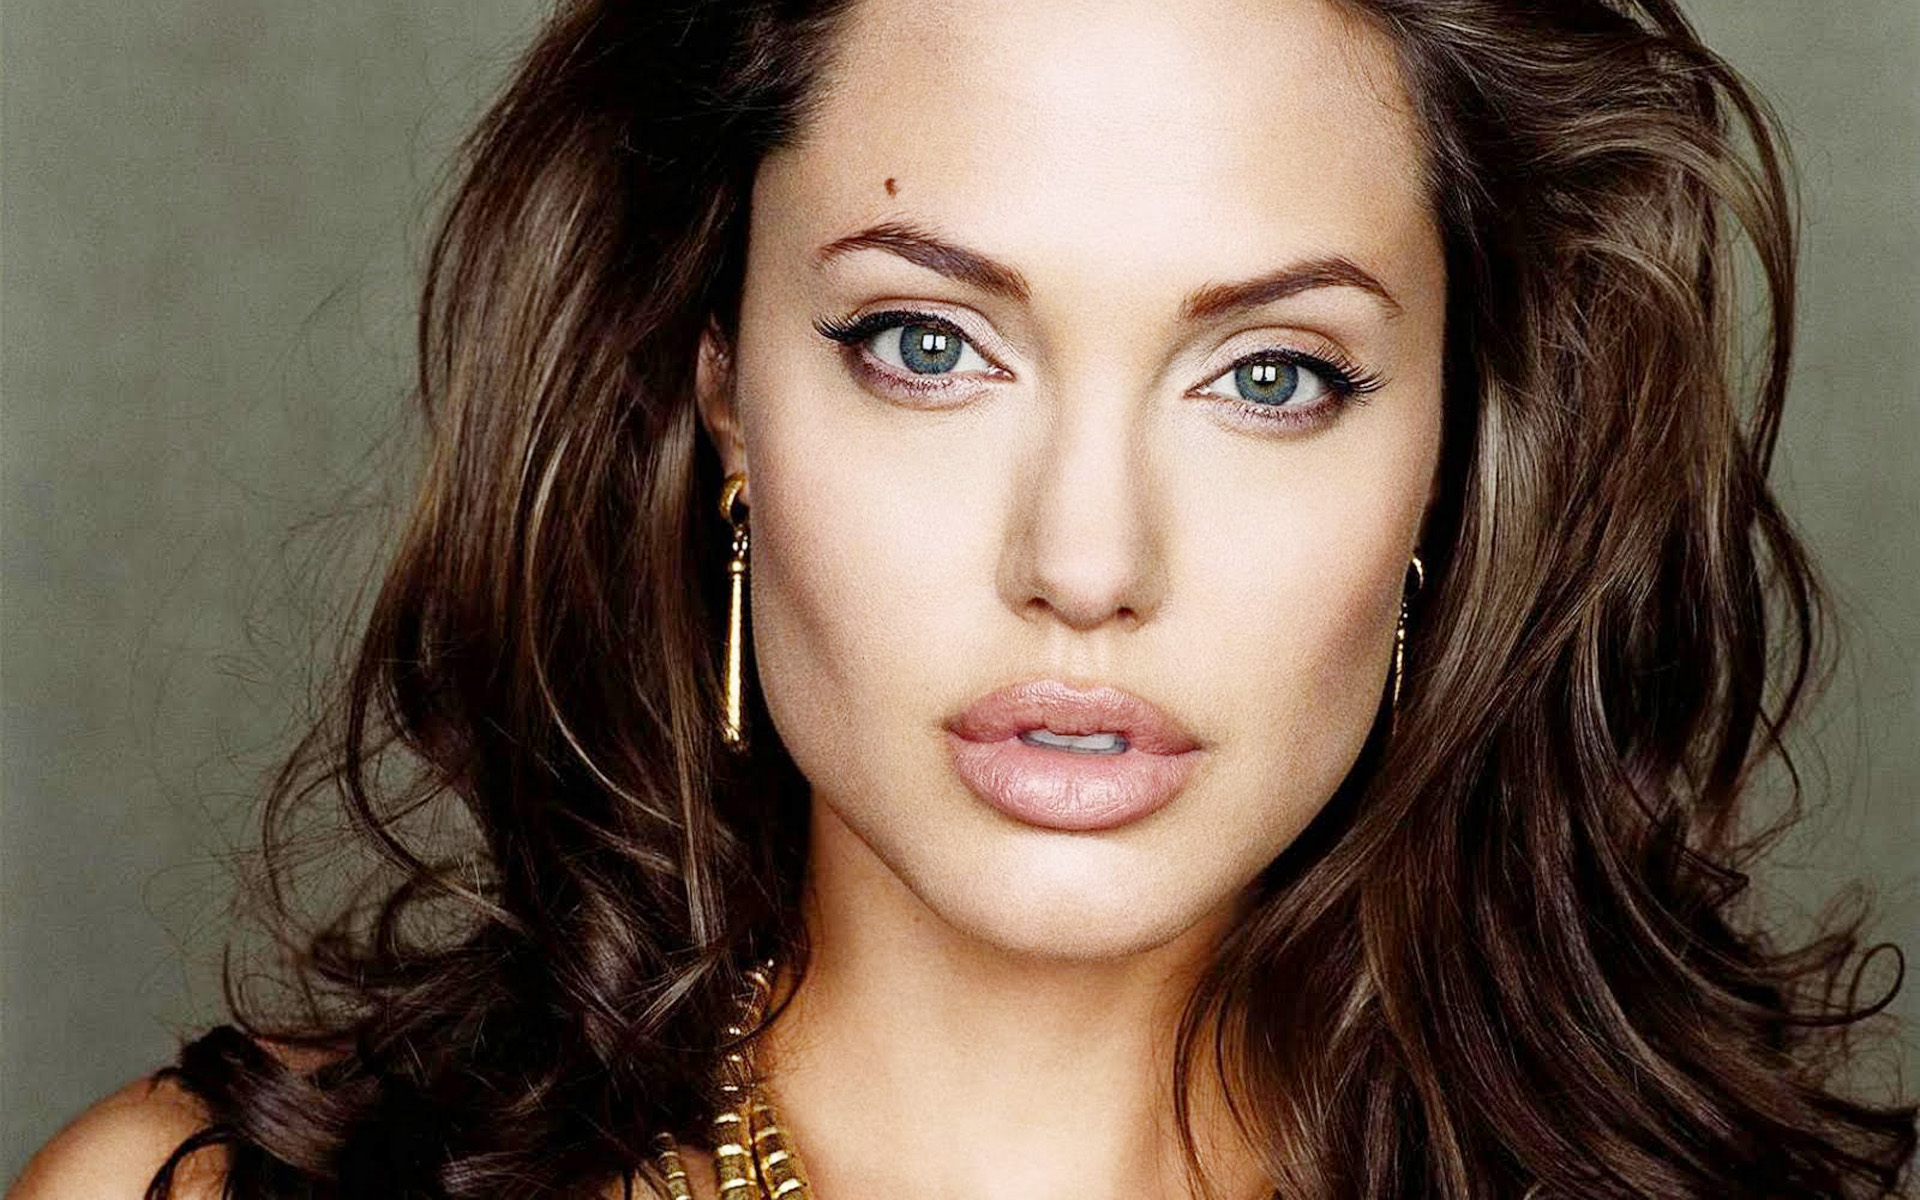 Angelina Jolie 7 Free Hd Wallpaper